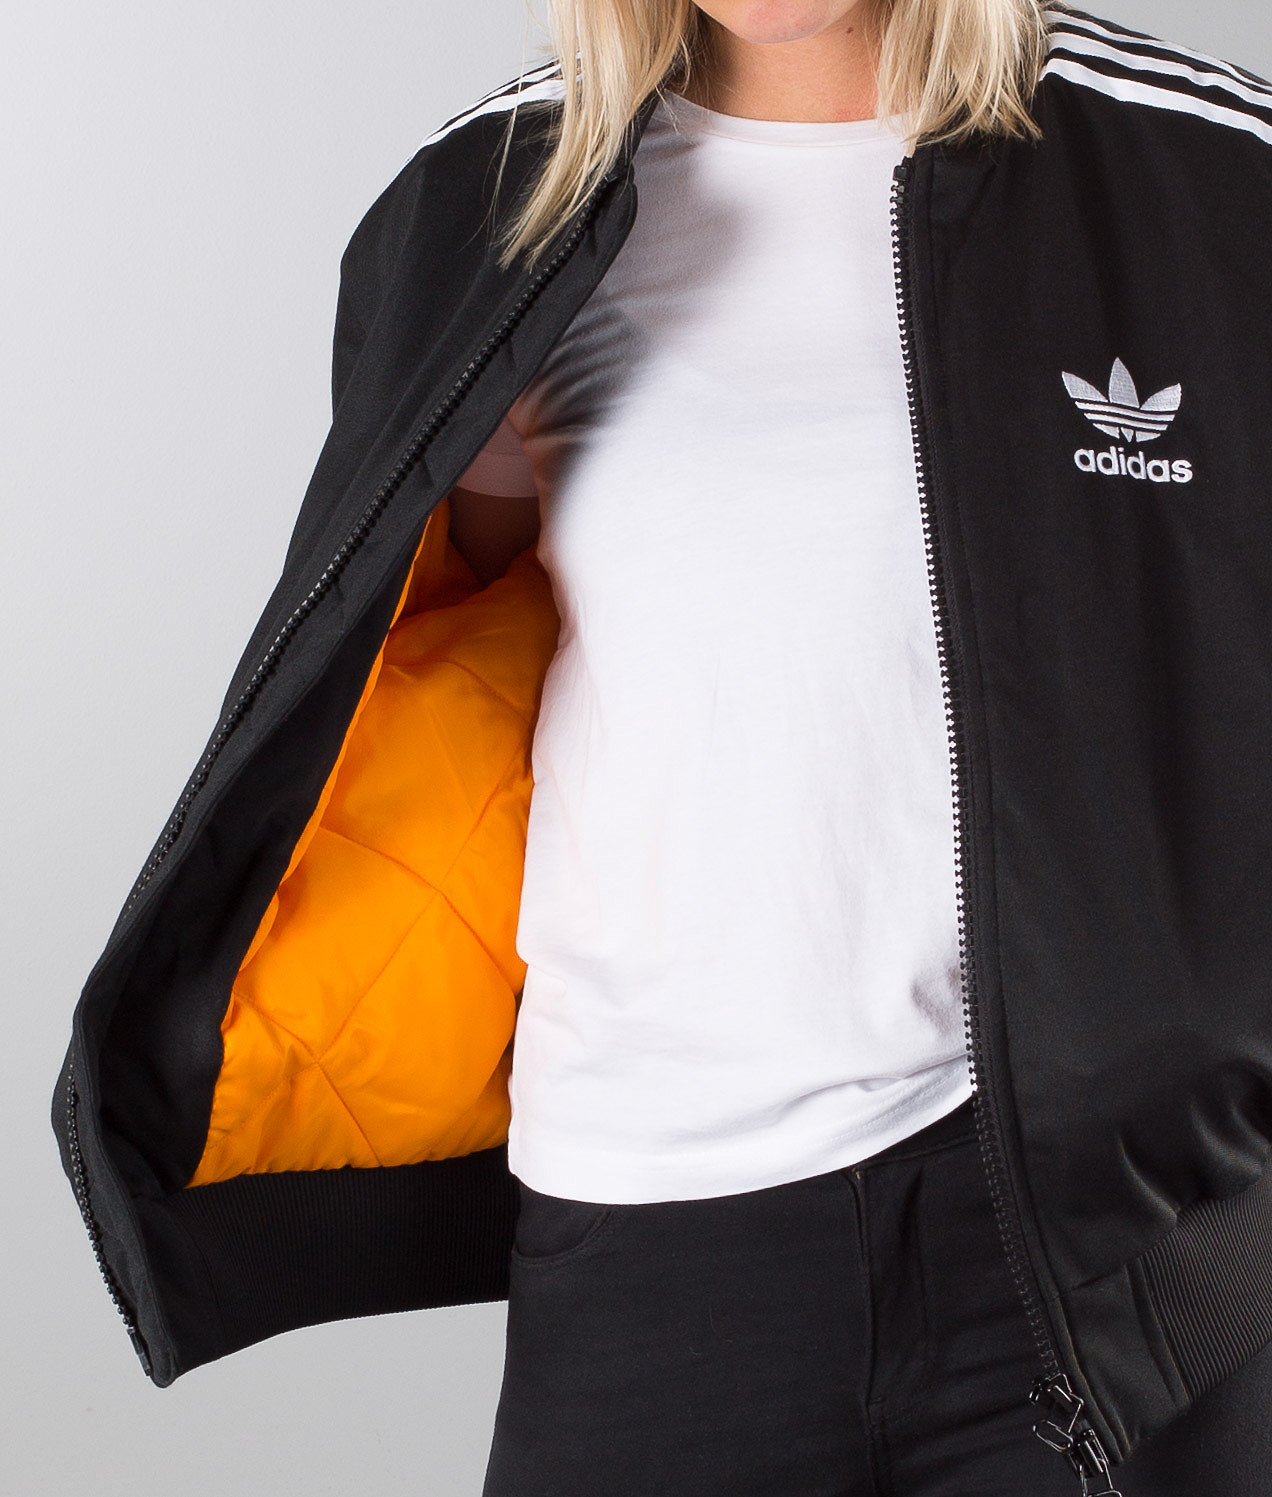 33b0a9844102 Adidas Originals Ma1 Padded Mate Unisex Jacket Black - Ridestore.com